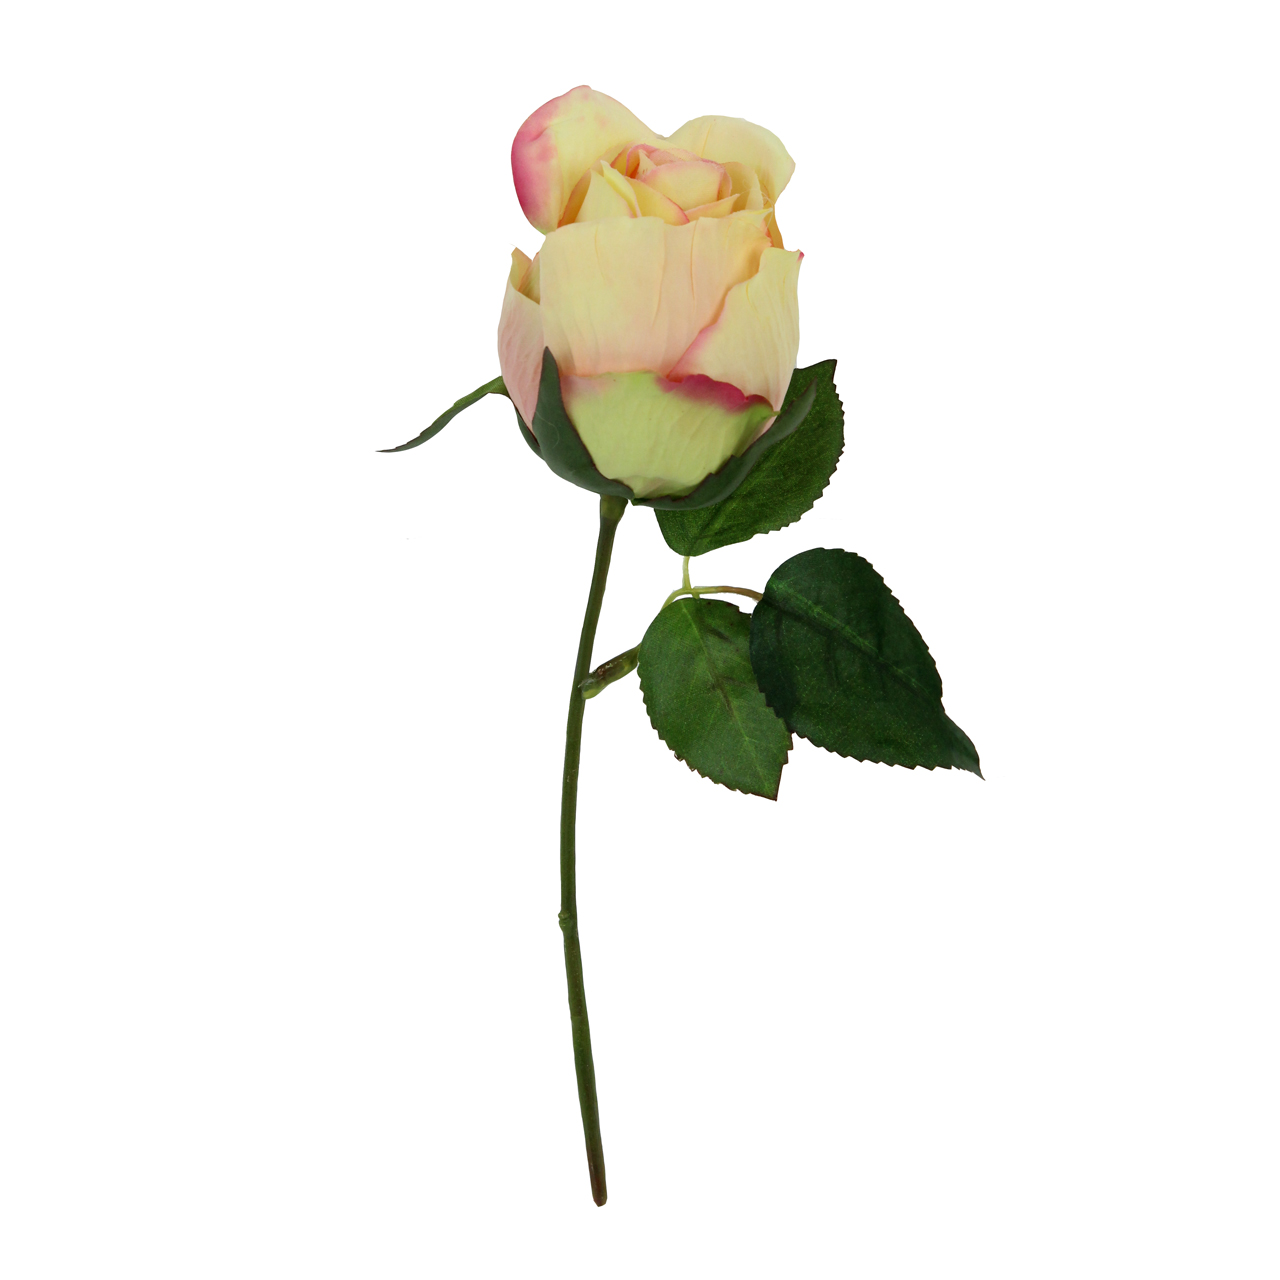 Floare Artificiala Trandafir Crem Cu Roz 15 Cm